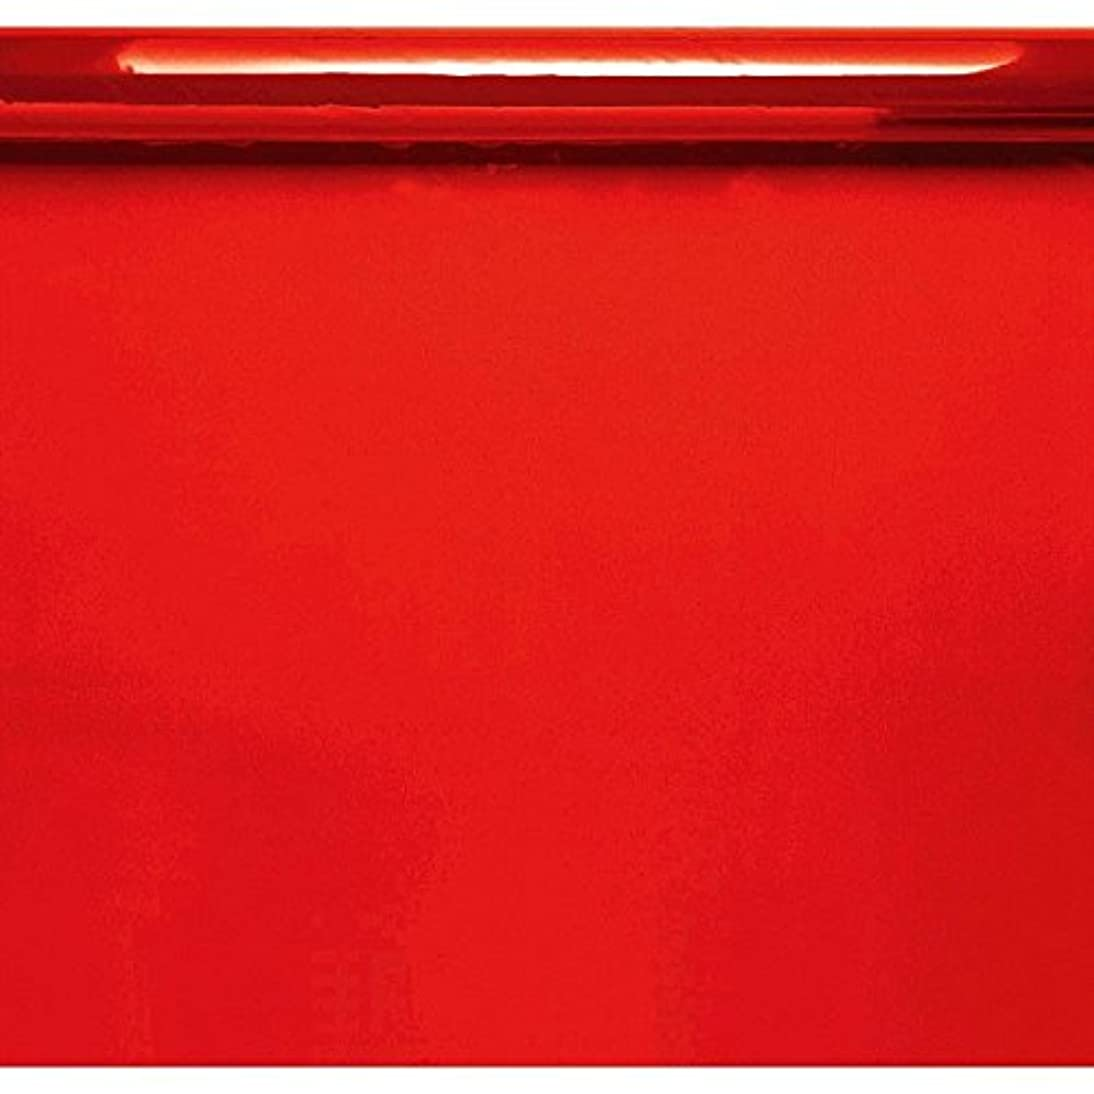 Amscan Colored Cellophane Sheets, Cellophane Wrap, Party Gift Supplies, Red, 40' x 30